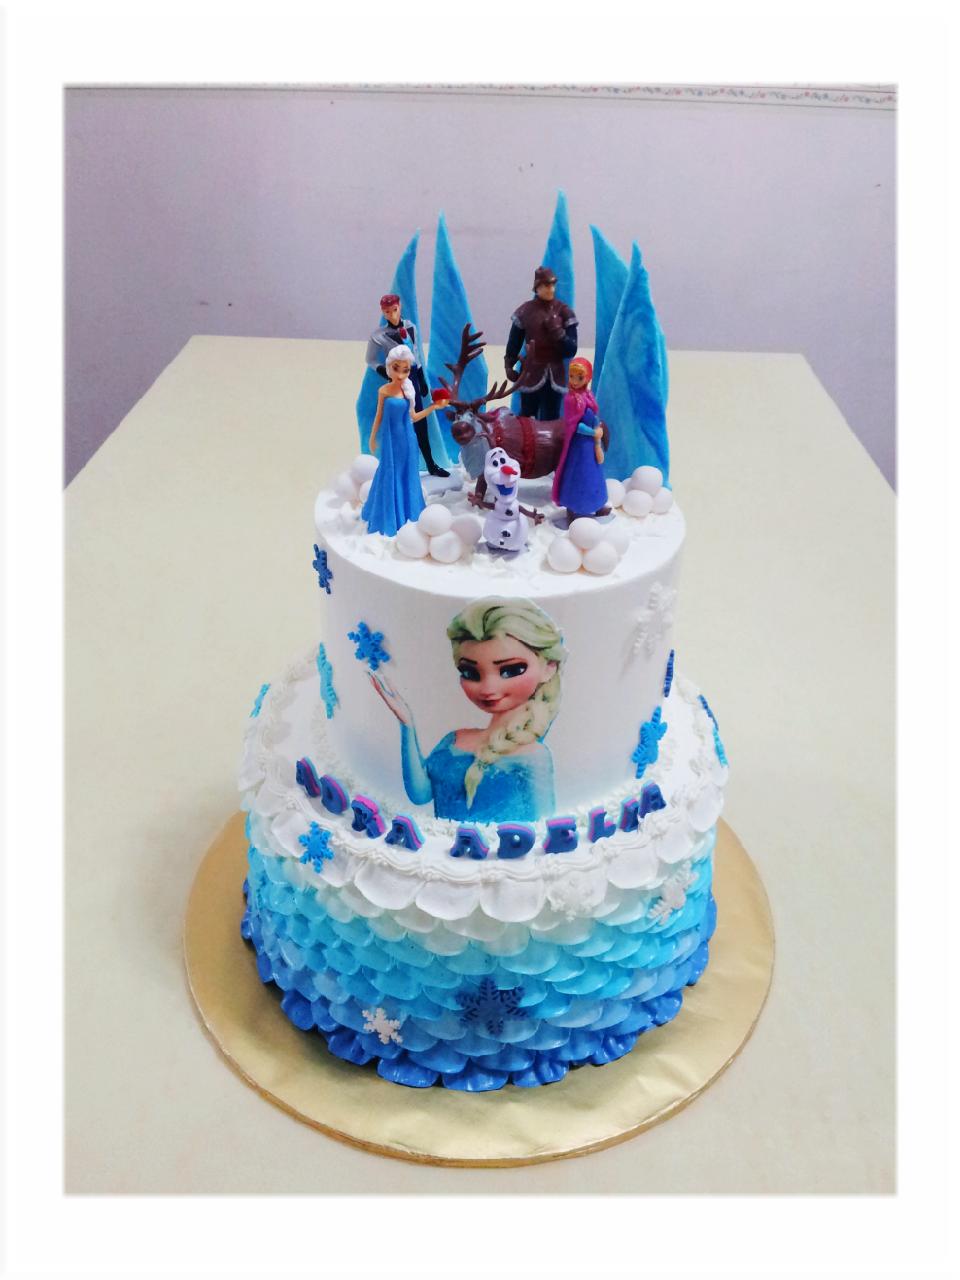 Cake Designs Of Frozen : MyPu3 Cake House: Frozen Cake